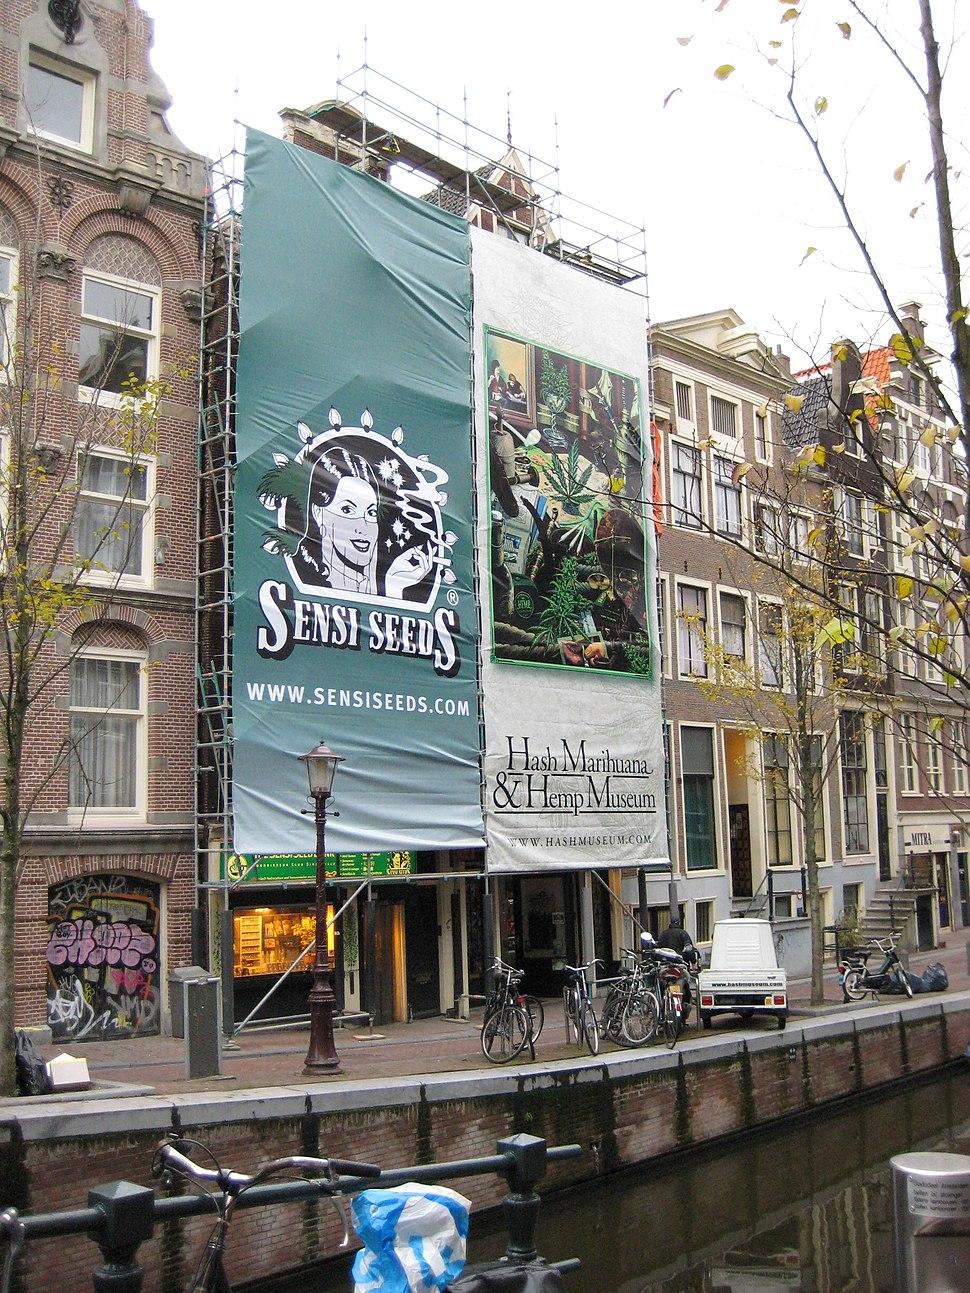 Hash museum amsterdam